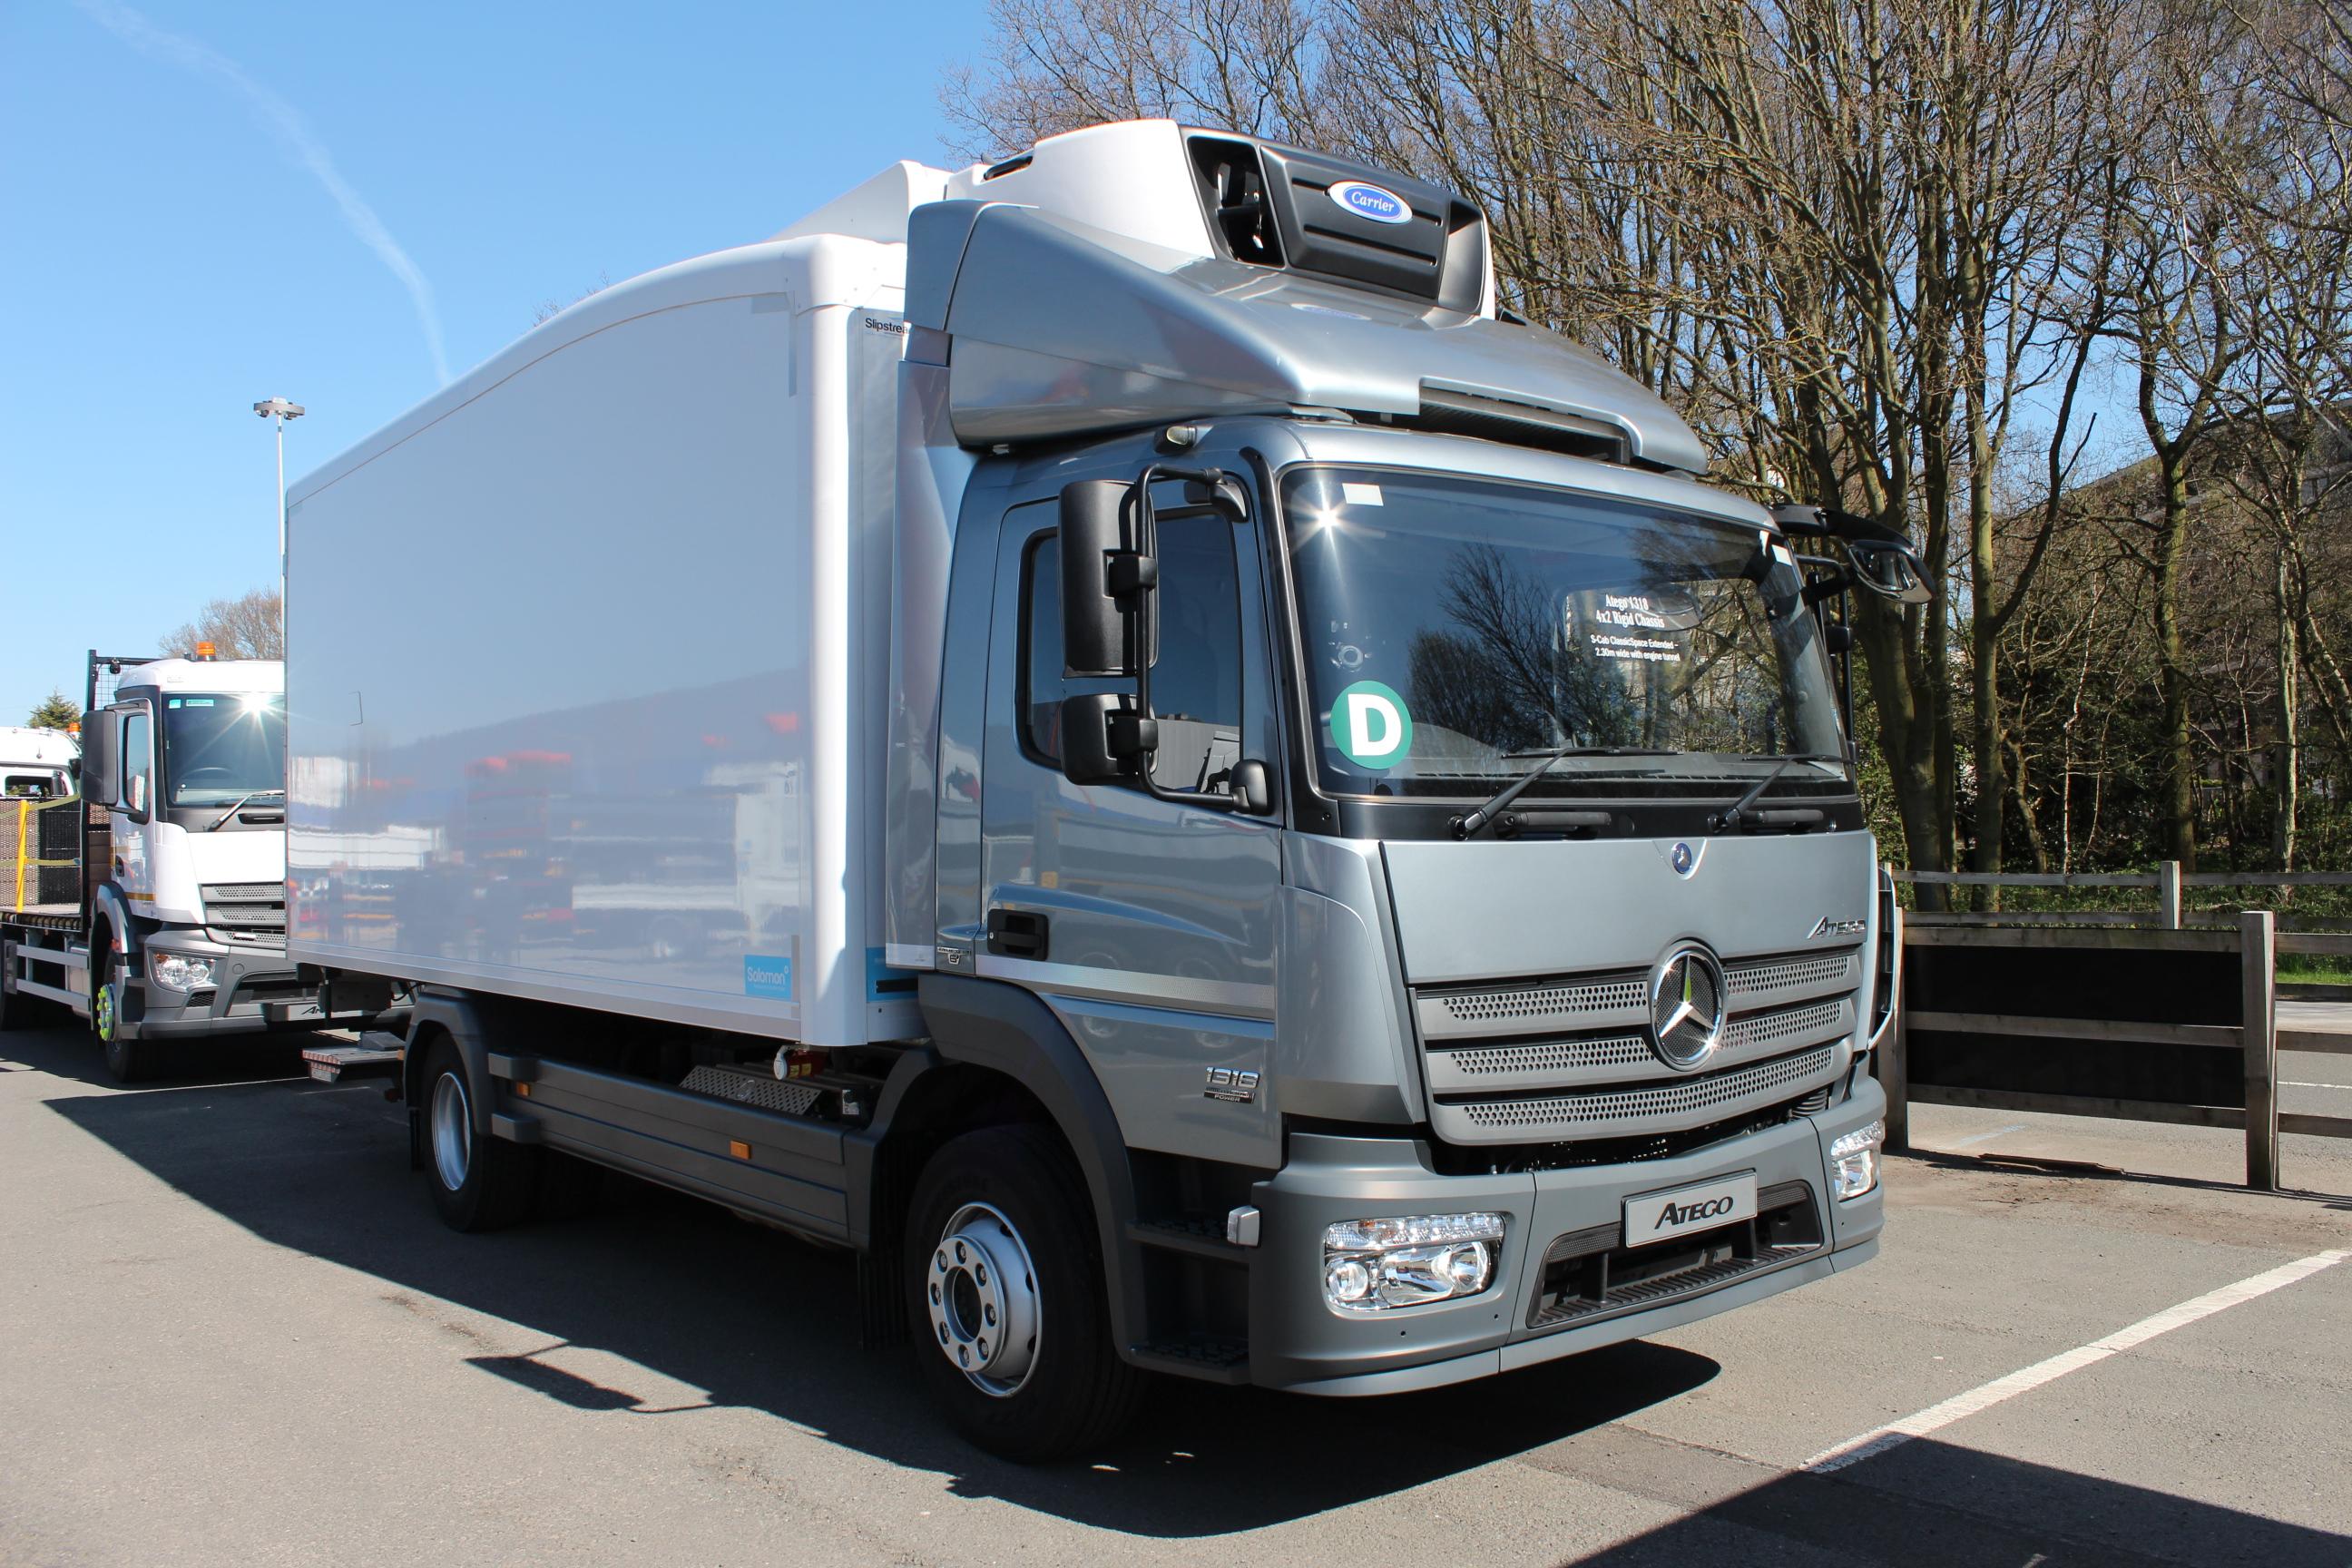 Mercedes Atego Aerodynamic fridge truck - Commercial Vehicle Dealer